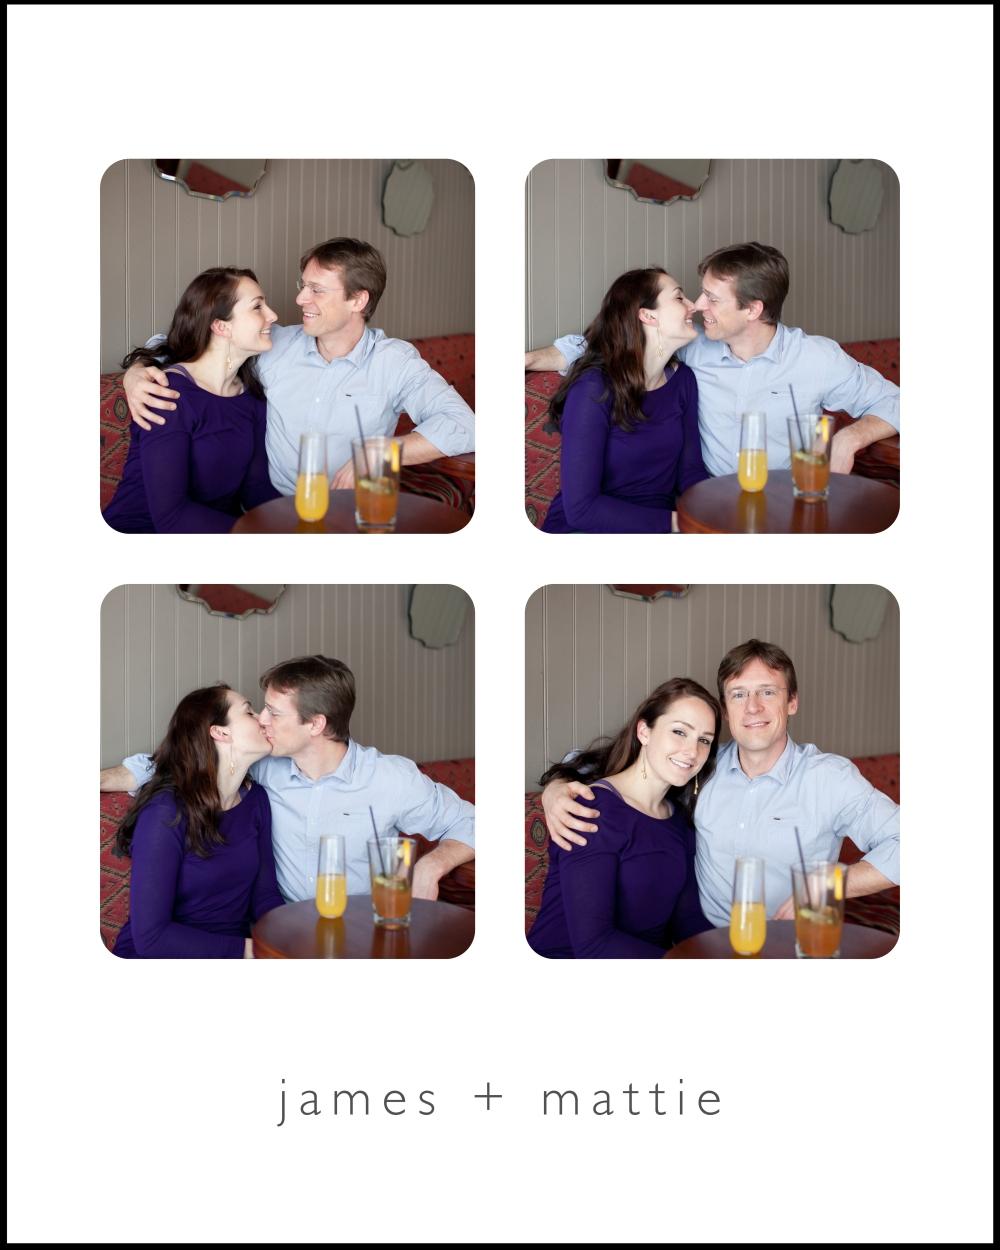 MattieJamesCollage copy